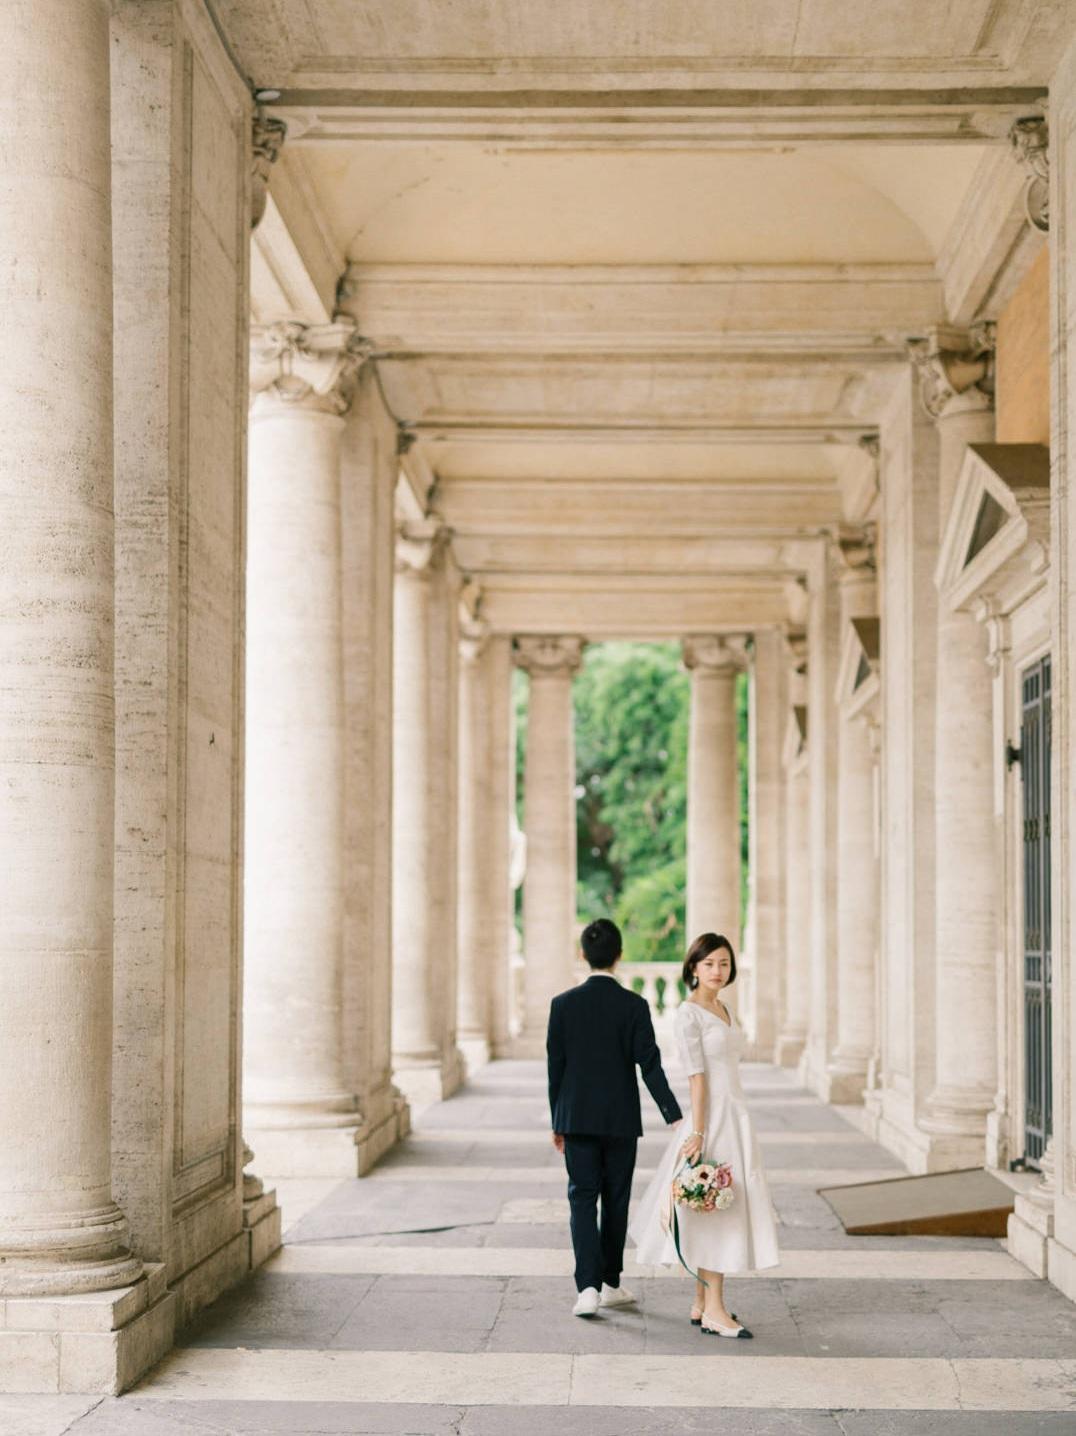 029_rome_fine_art_film_wedding_photography_chymo_more.jpg